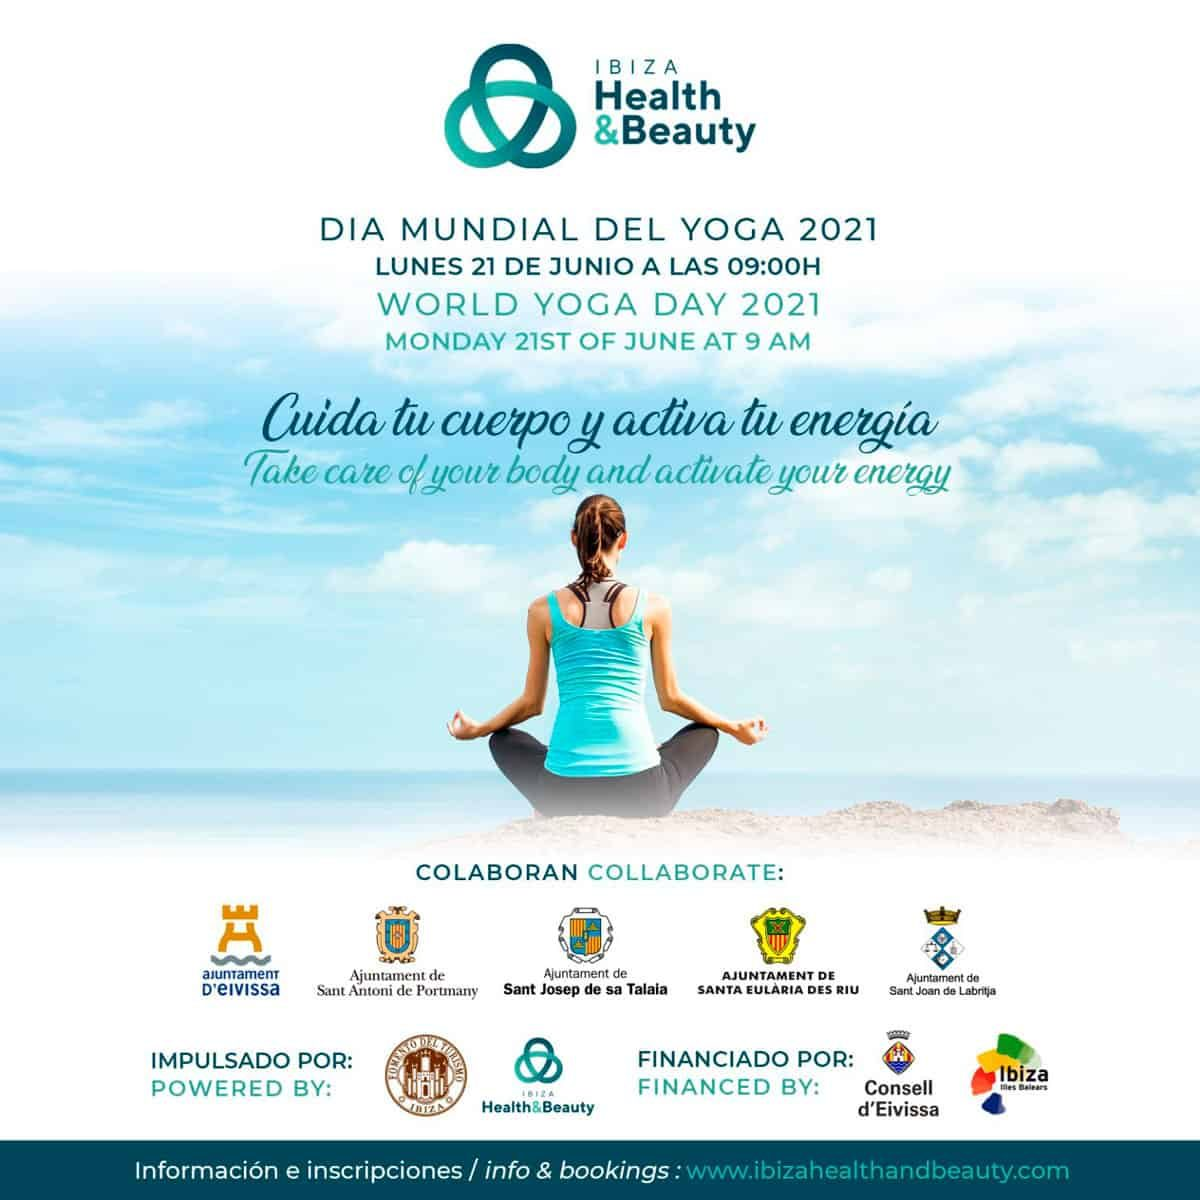 dia-mundial-del-yoga-ibiza-2021-welcometoibiza